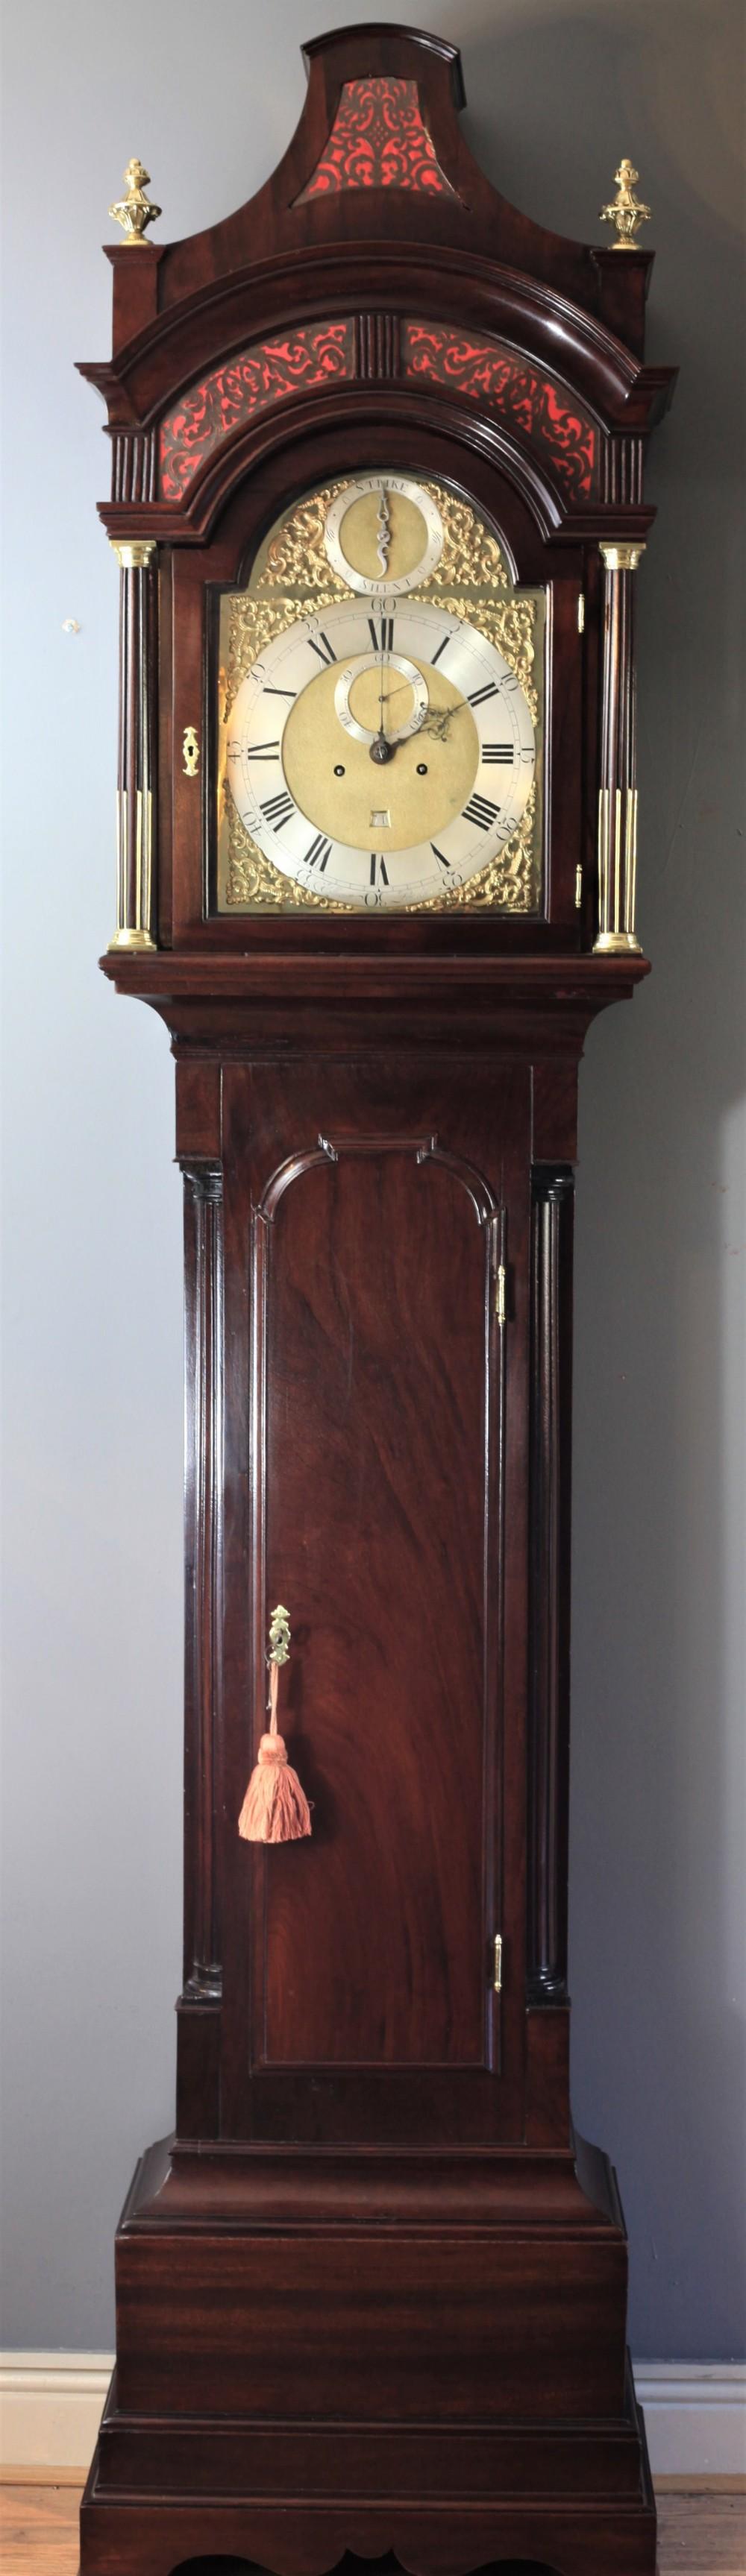 stunning flame mahogany pagoda longcase clock by john ellicott frs c1760